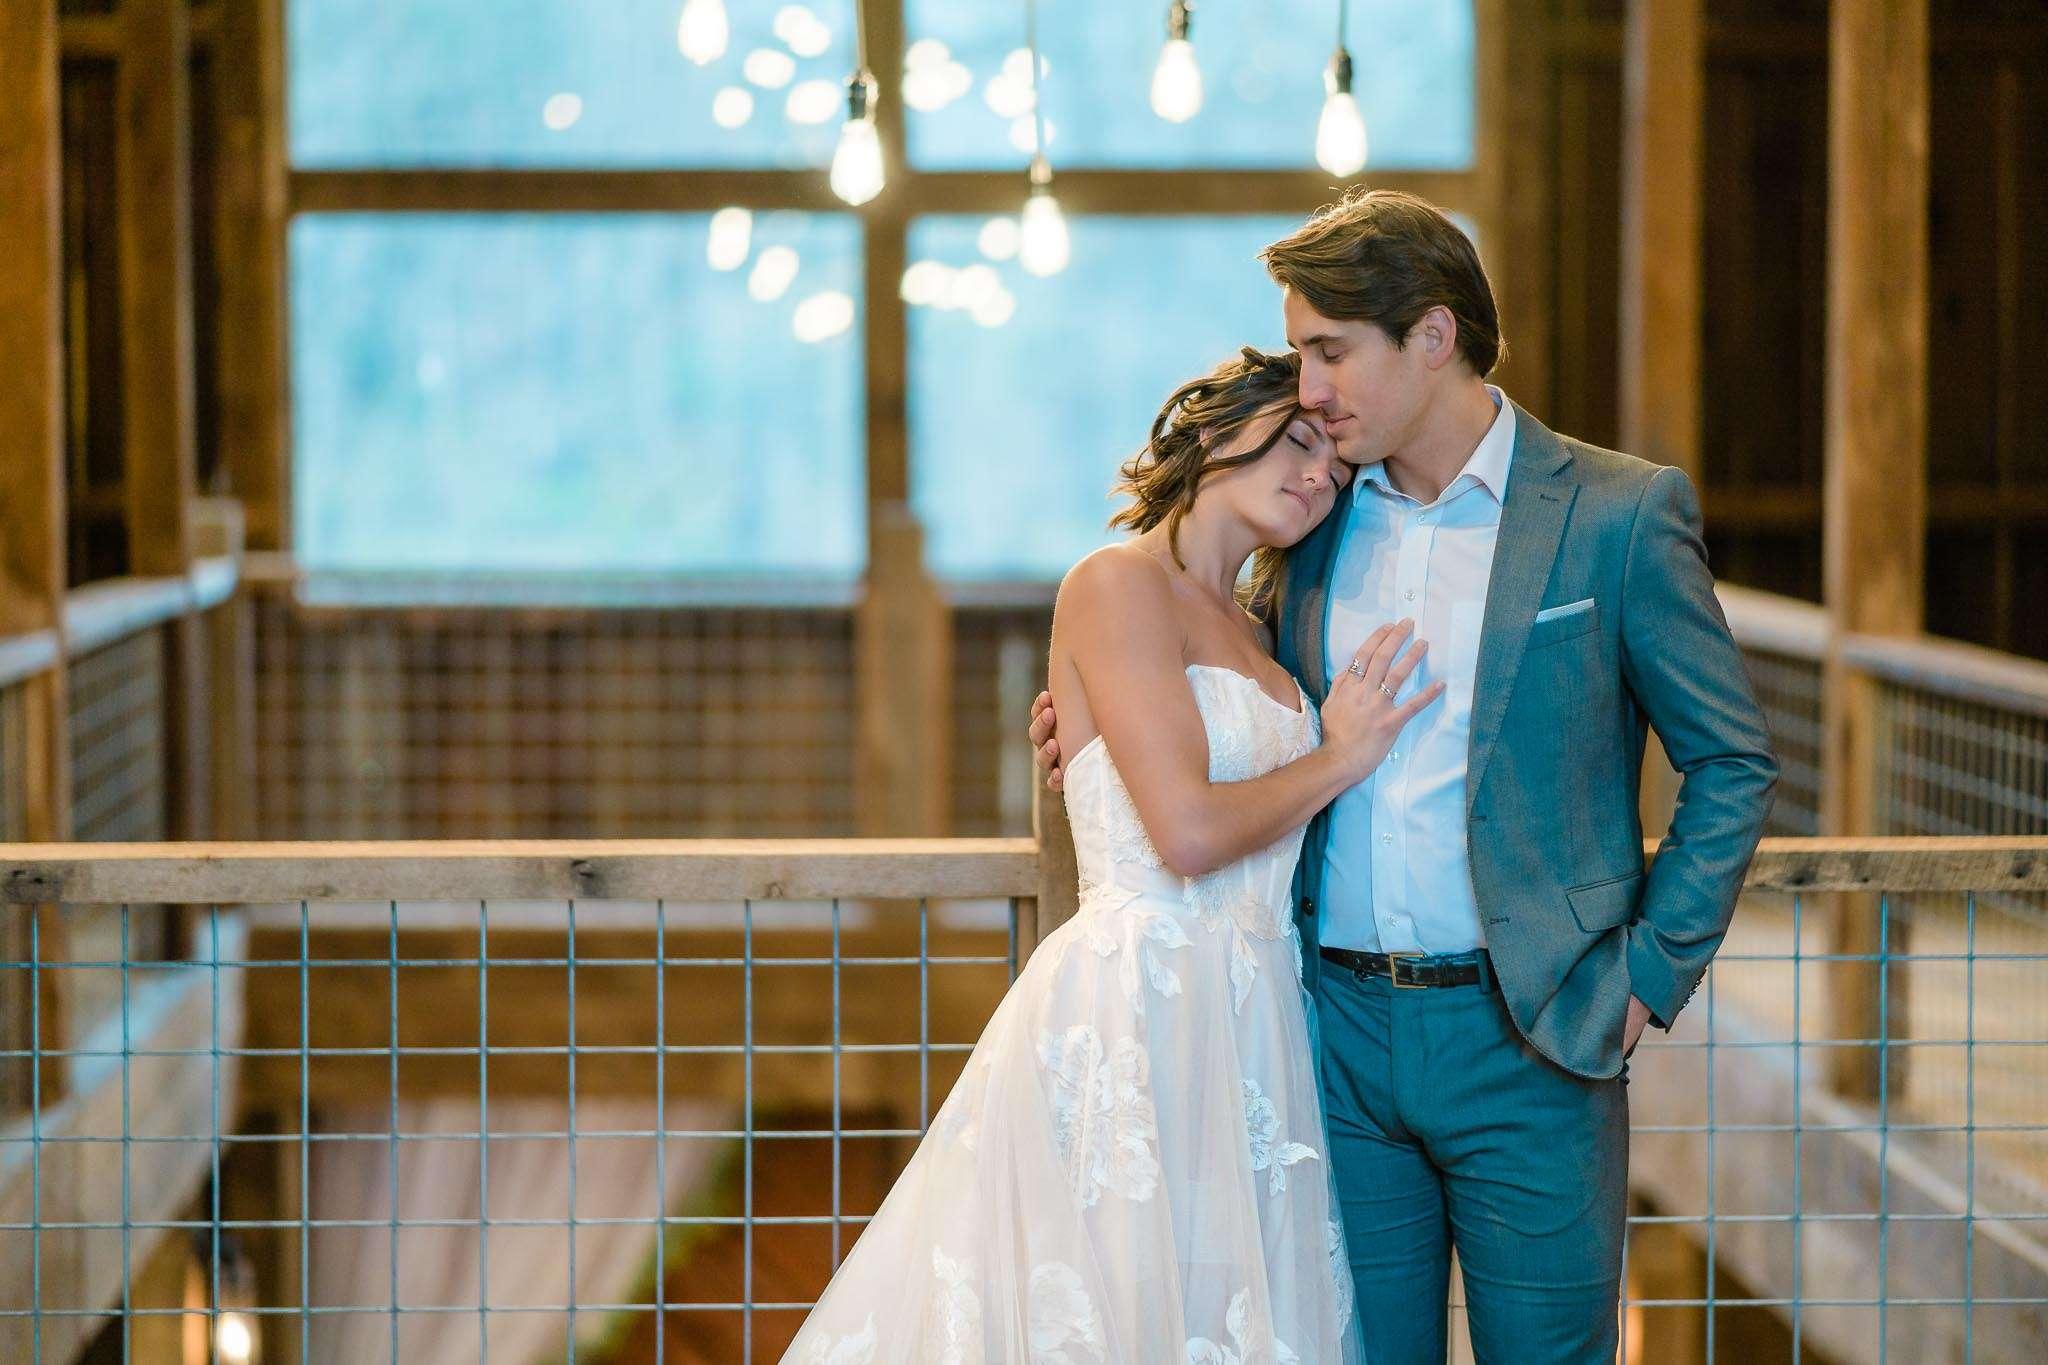 Owensboro, KY Wedding Photographer - Keepsake Wedding Photography